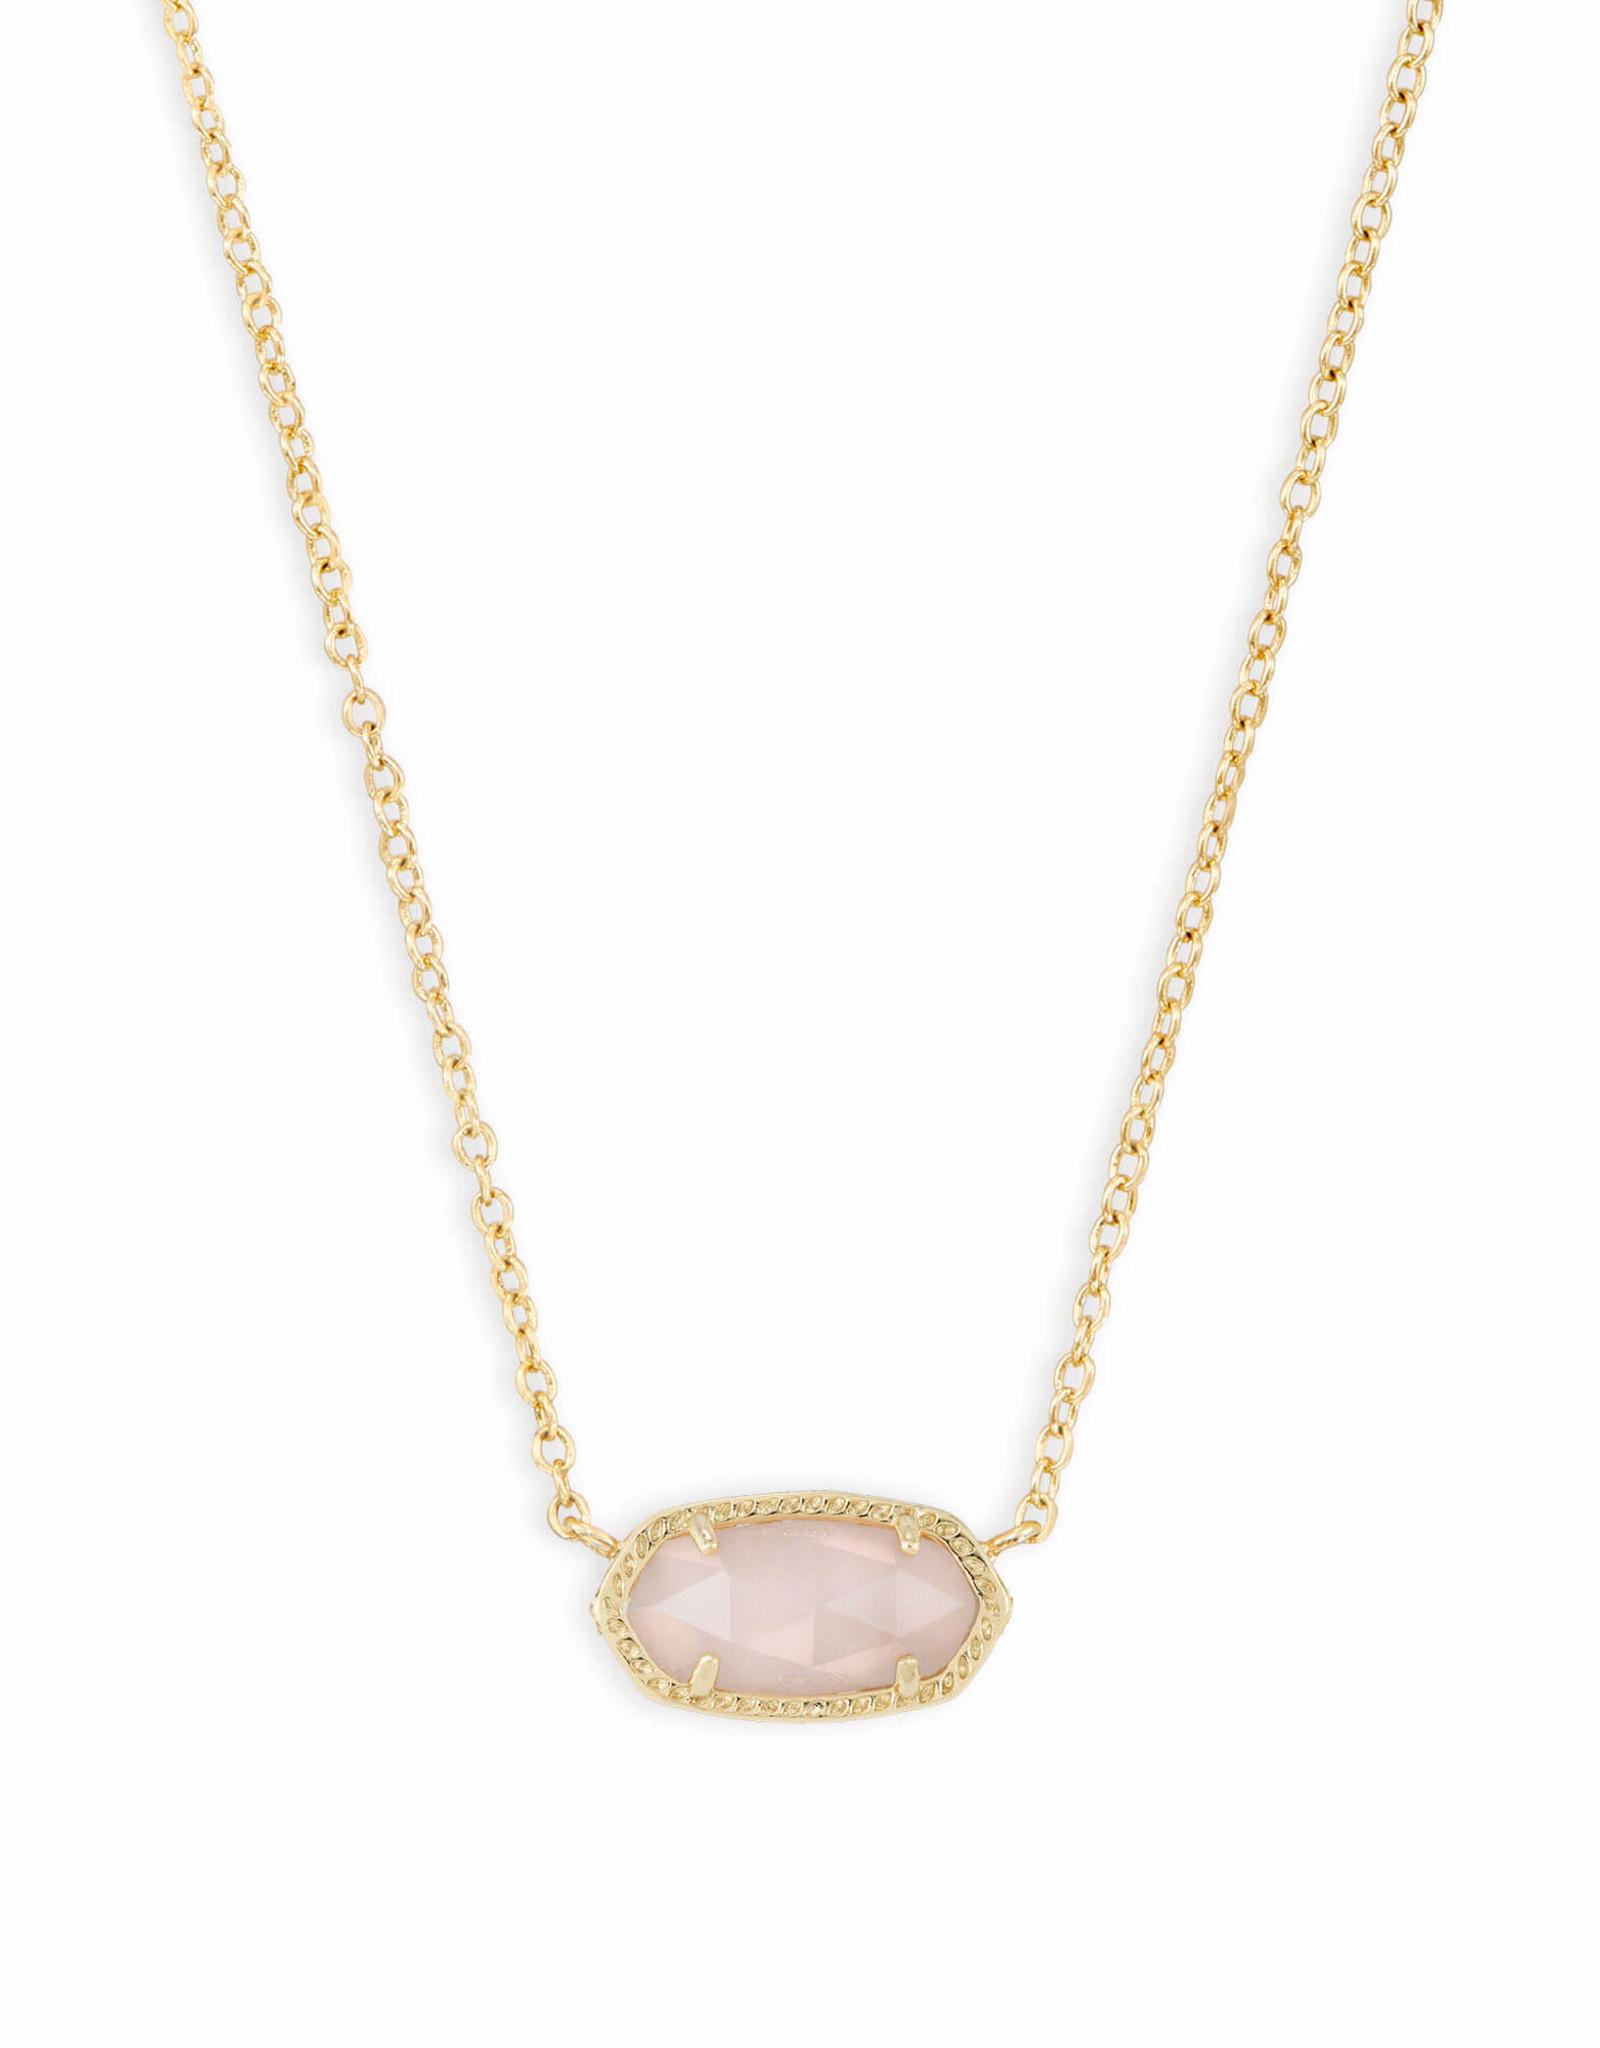 Kendra Scott Elisa Necklace - Rose Quartz/Gold